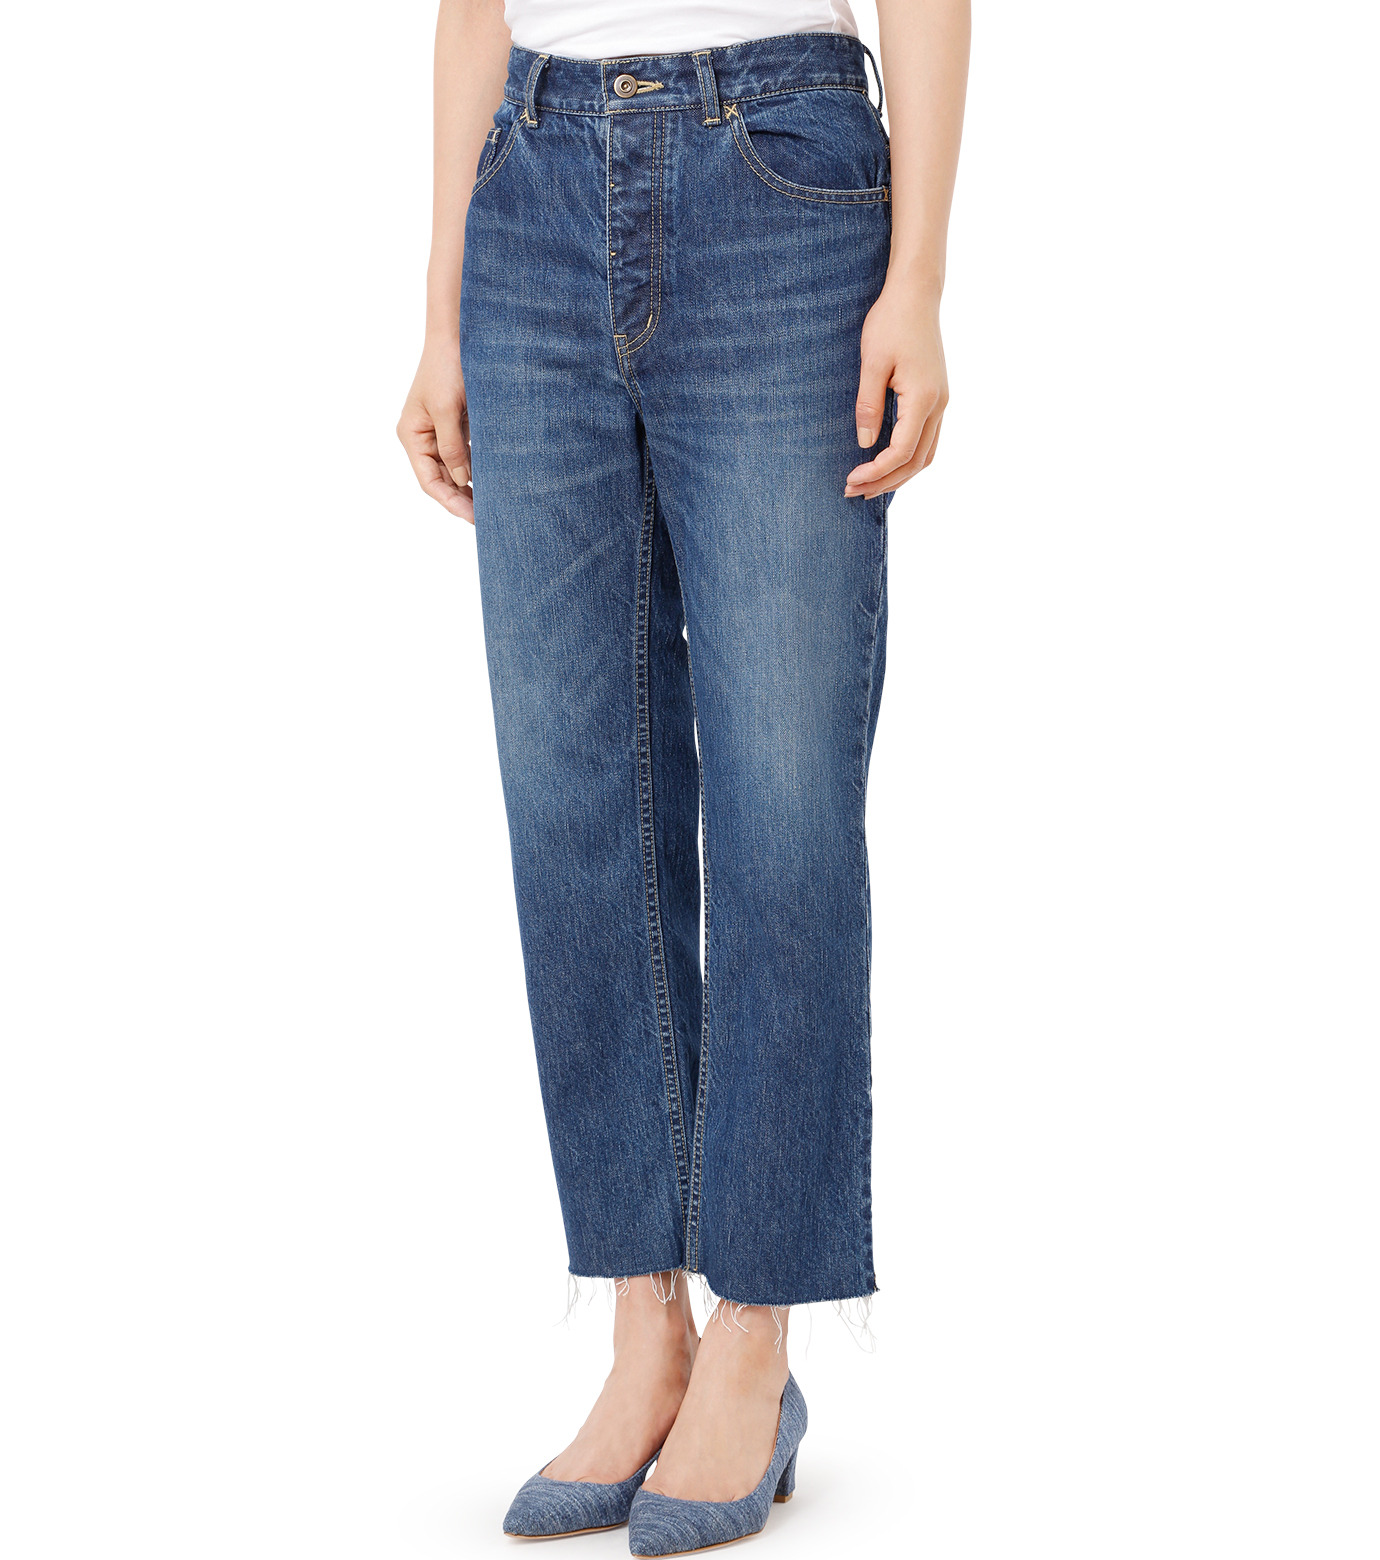 LE CIEL BLEU(ルシェルブルー)のストレートデニムパンツ-INDIGO(パンツ/pants)-18A68202 拡大詳細画像1